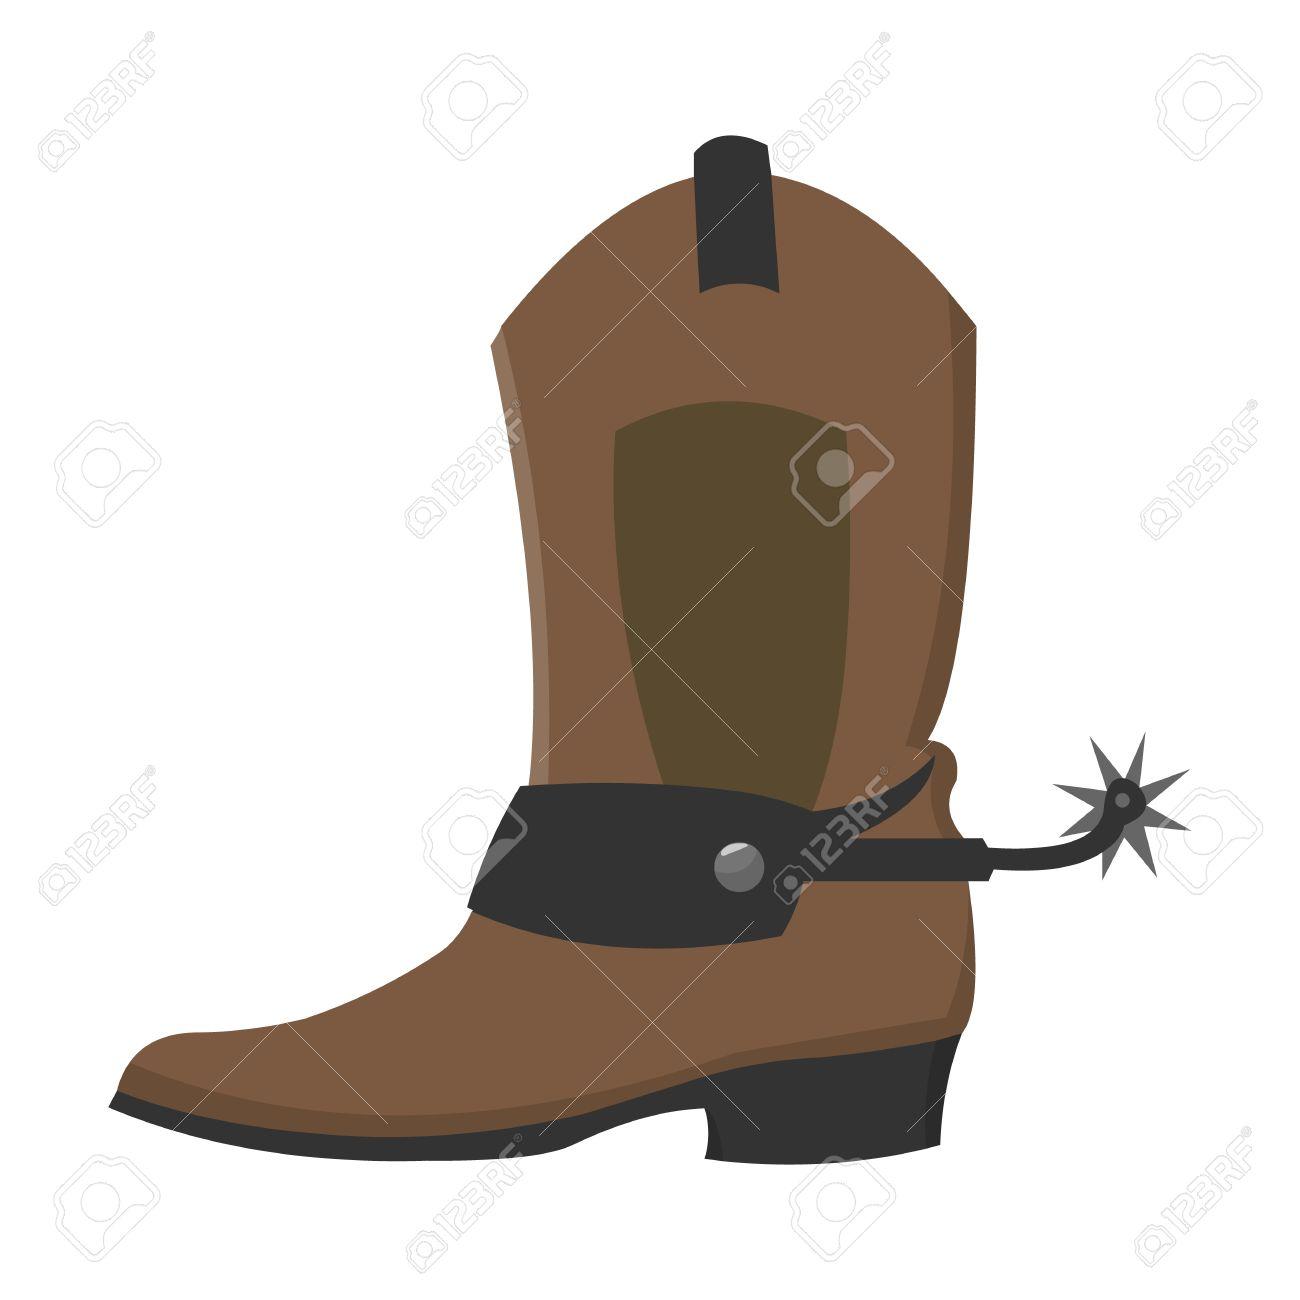 cowboy boot icon cartoon singe western icon from the wild west rh 123rf com cartoon pics of cowboy boots cartoon pictures of cowboy boots and hats